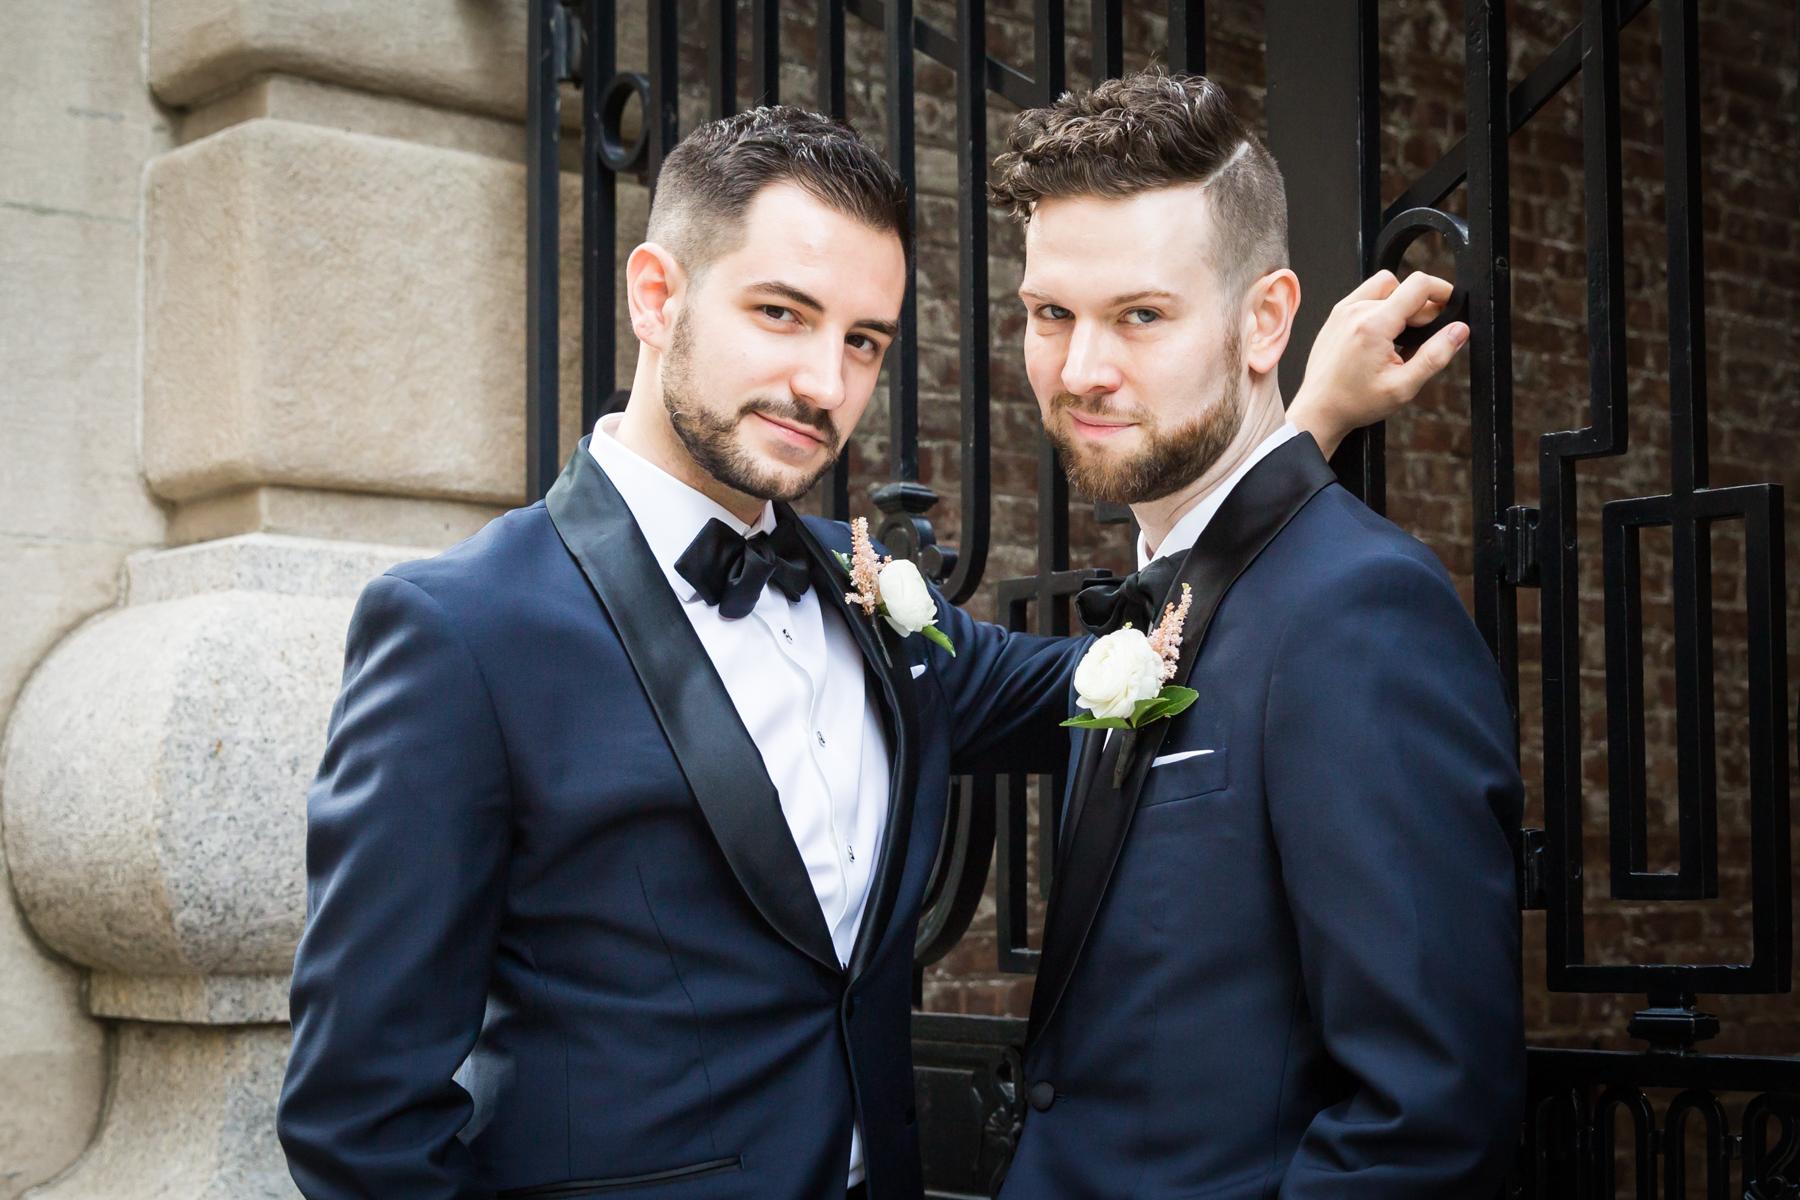 Wedding portraits of two grooms The Dakota apartment building